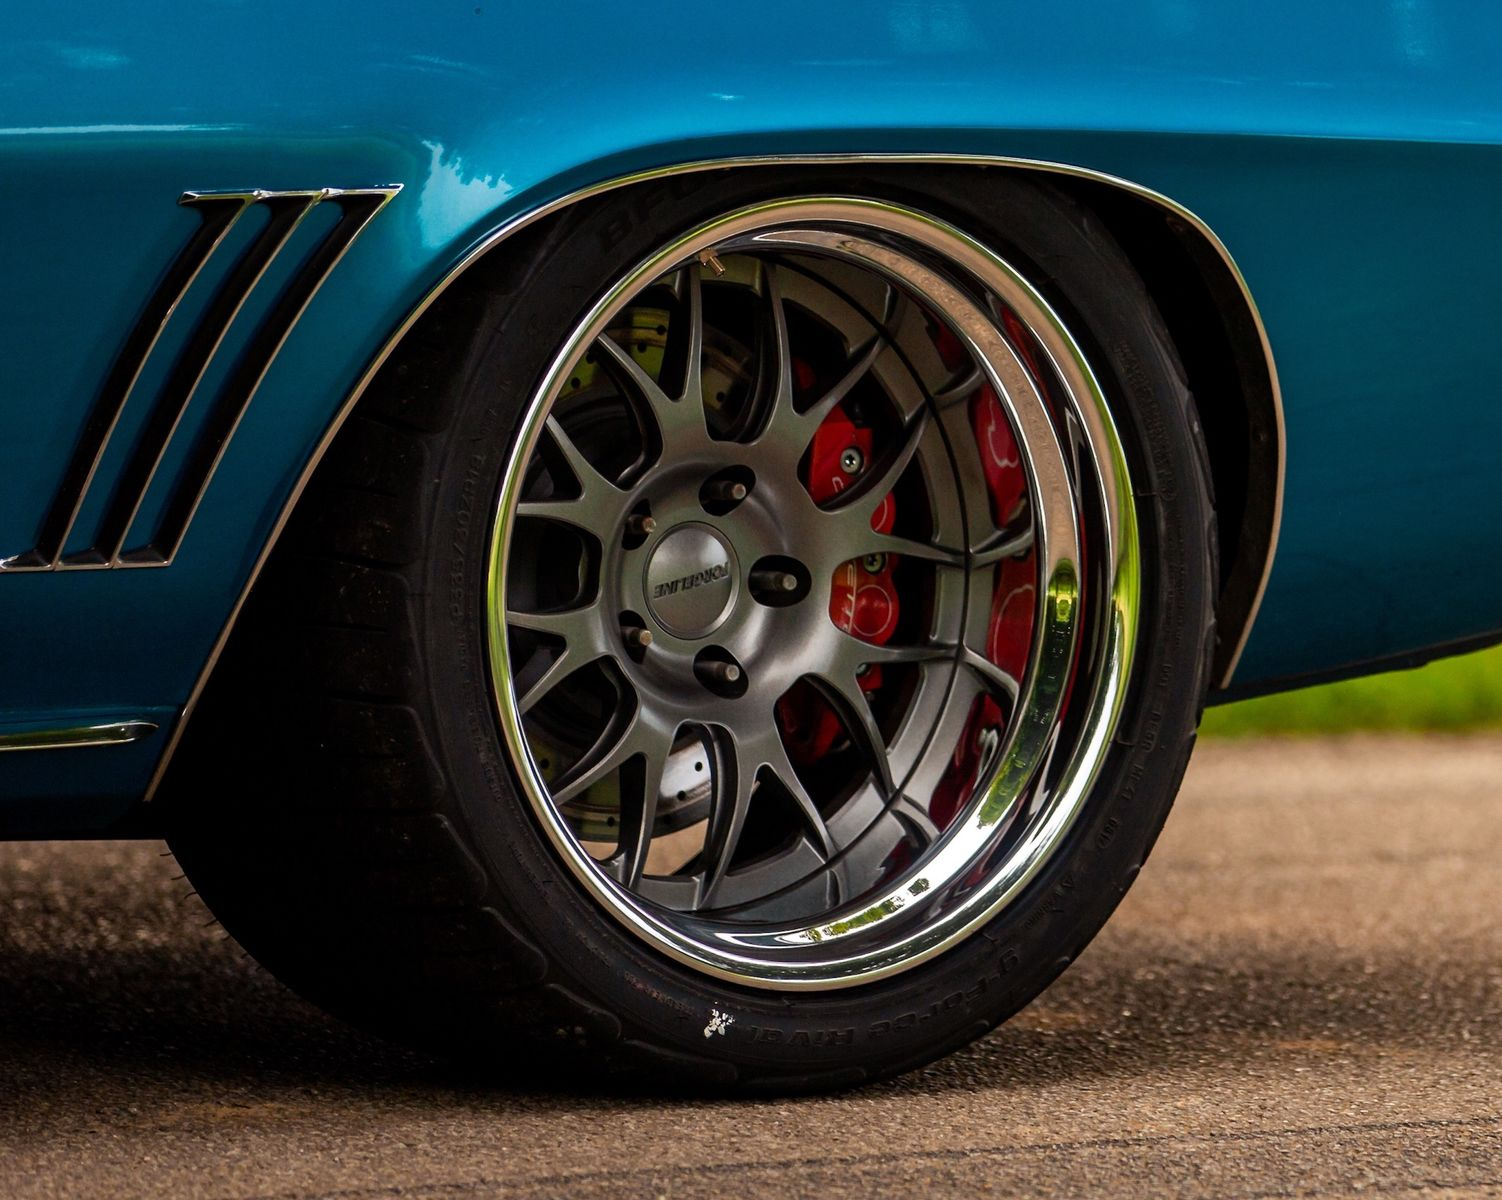 1969 Chevrolet Camaro | David Webb's Pro-Touring '69 Camaro on Forgeline GW3 Wheels